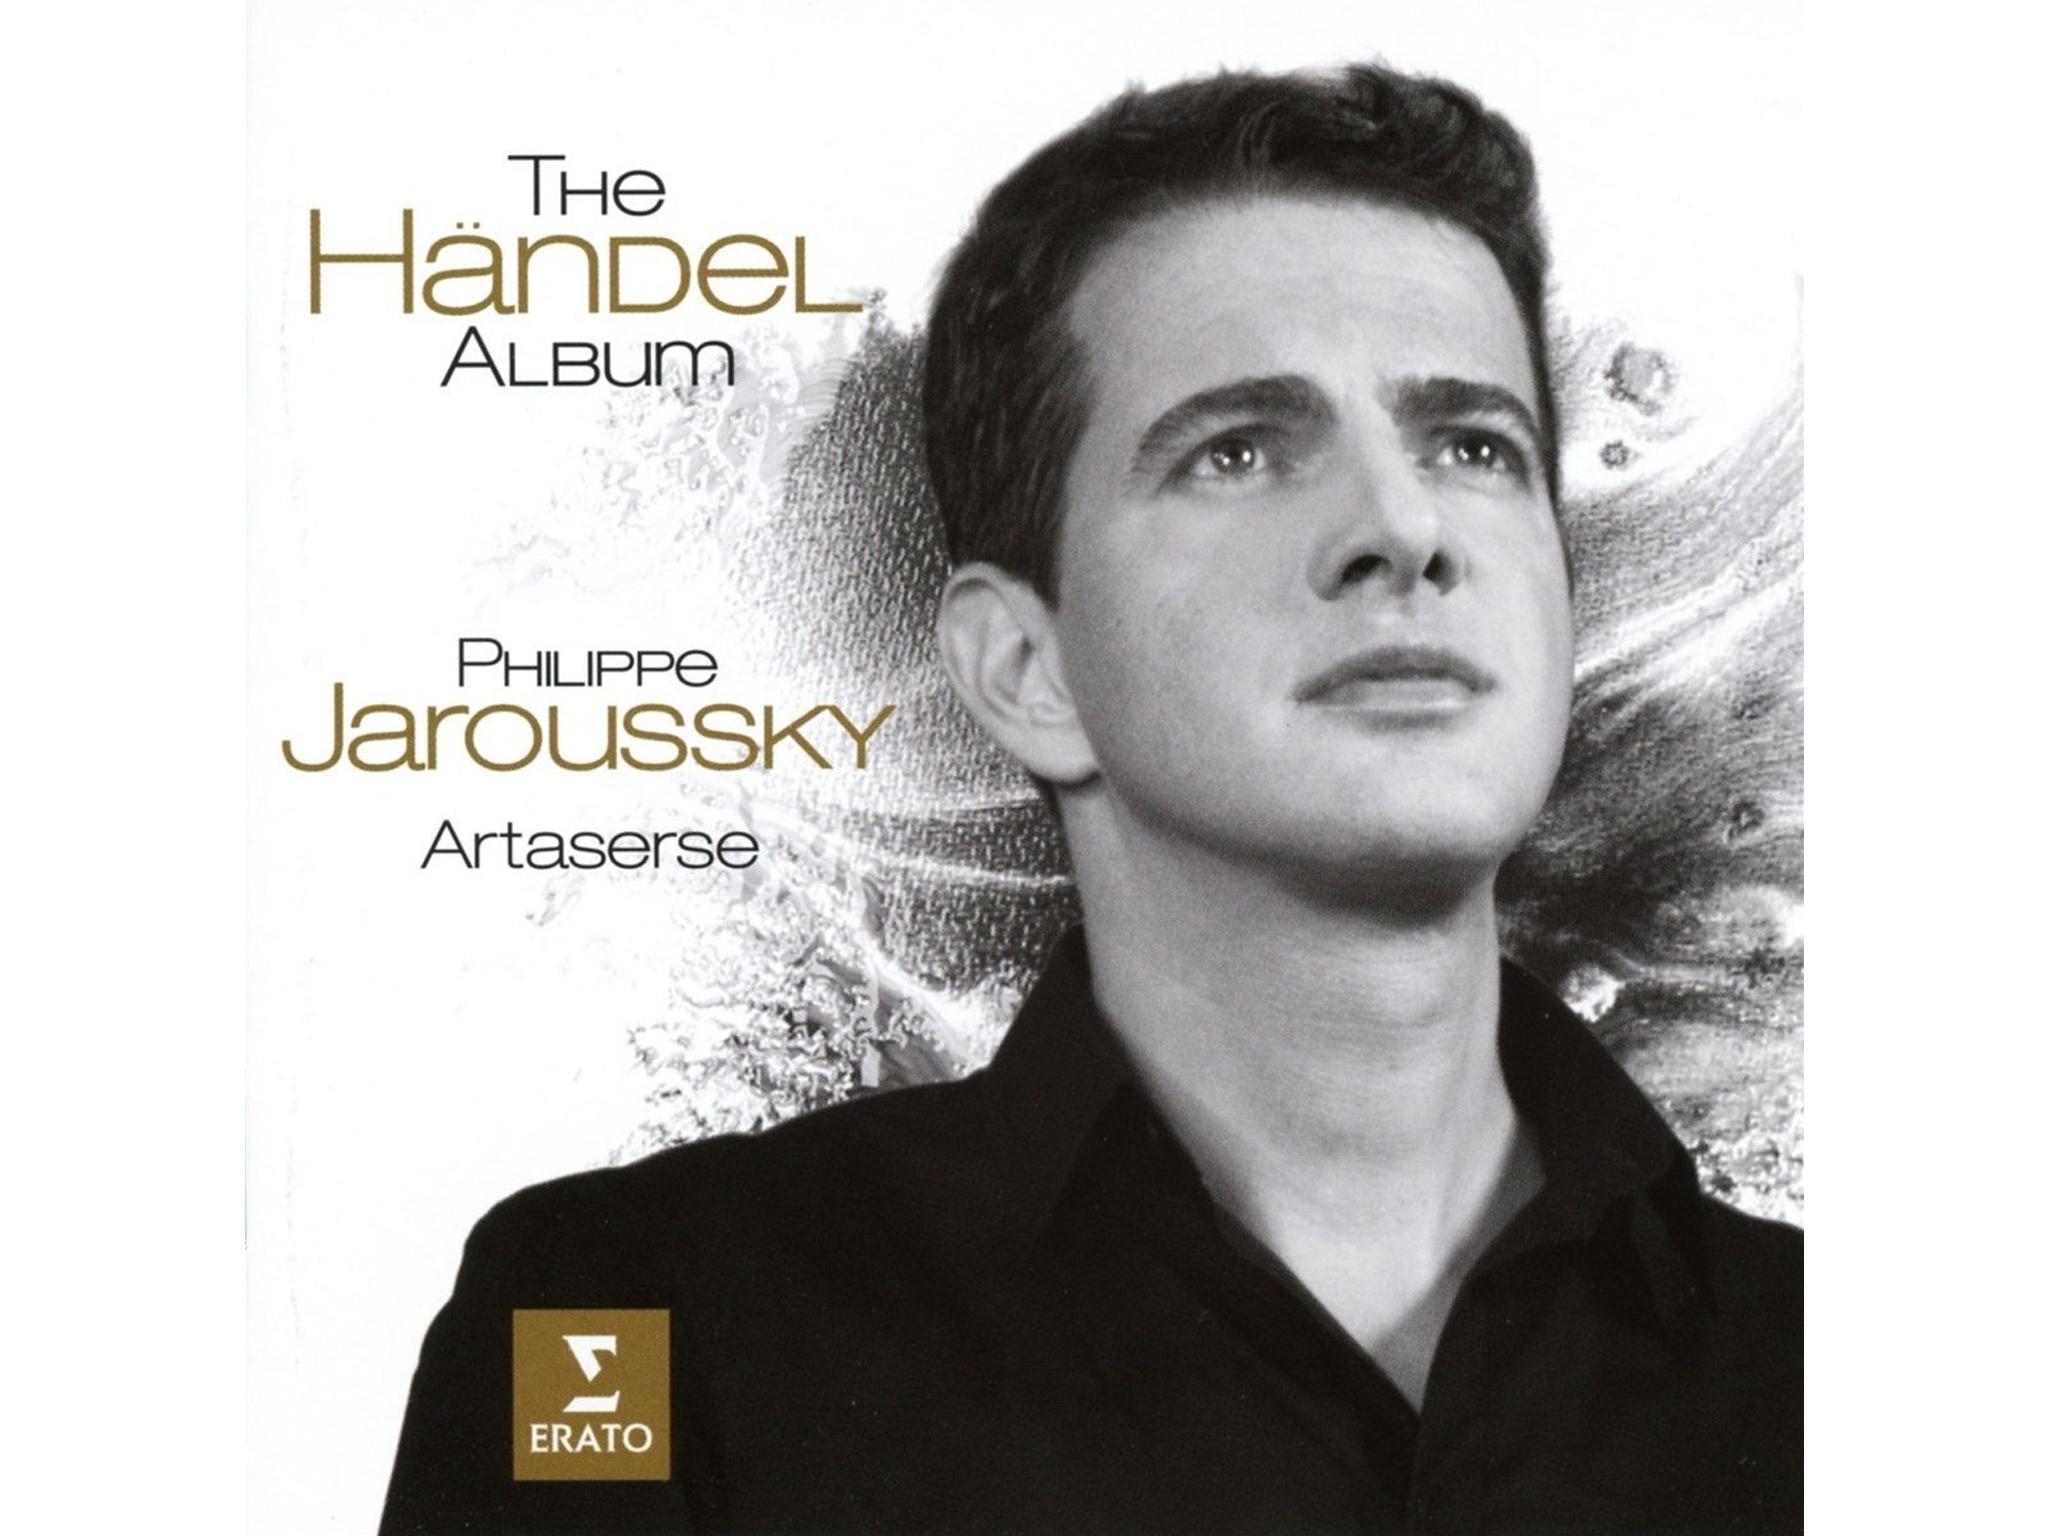 The Handel Album: Philippe Jaroussky